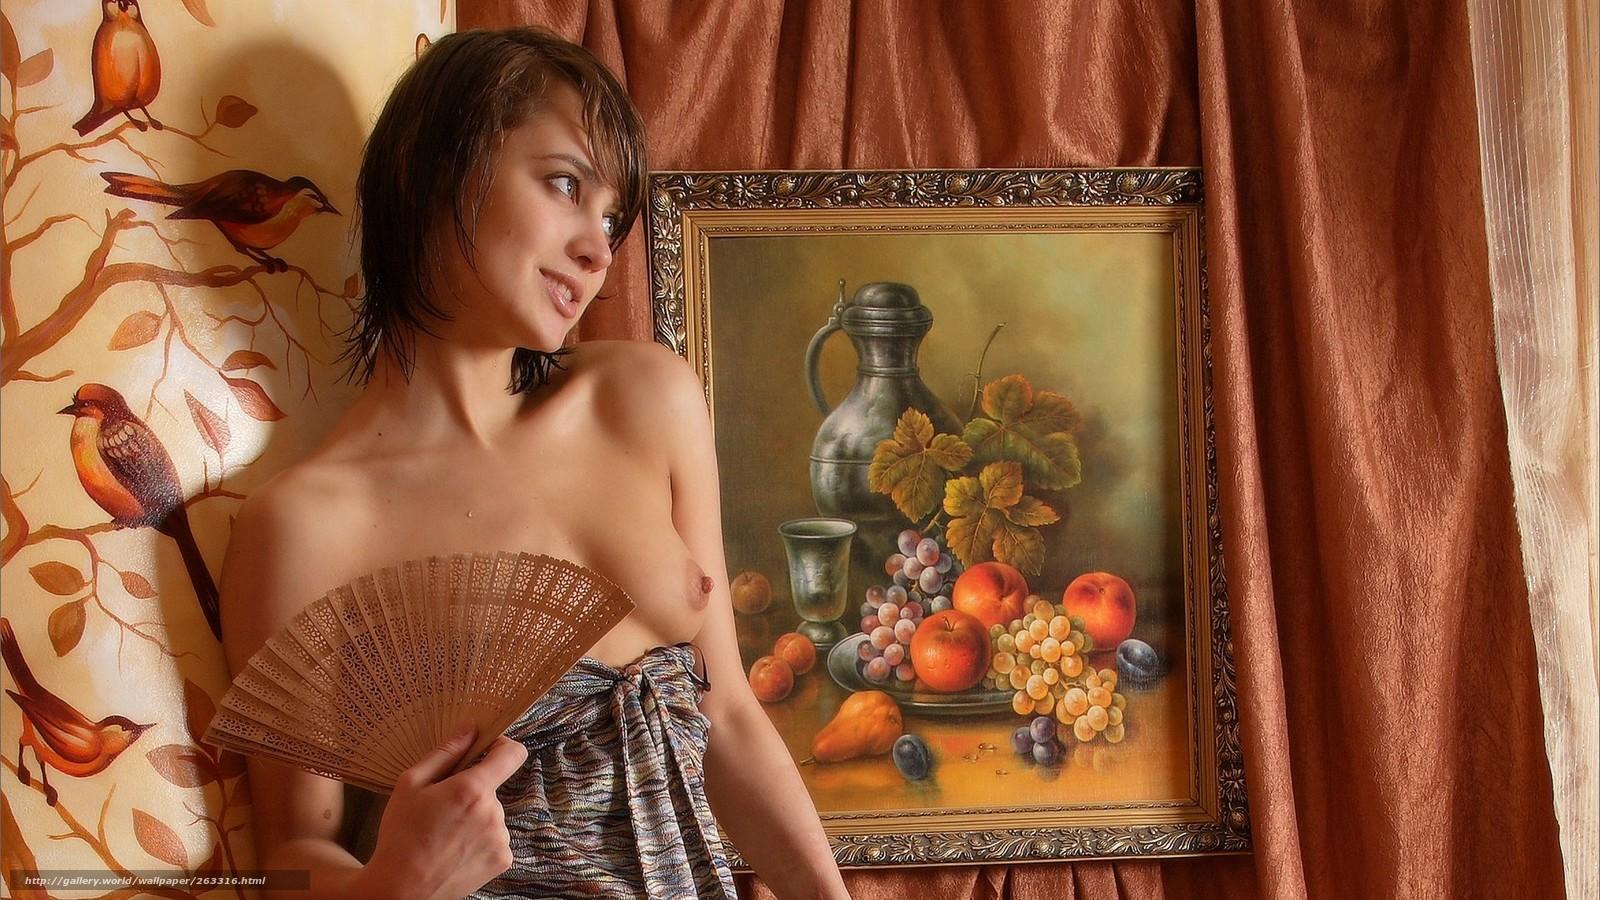 dzhina-vayld-porno-foto